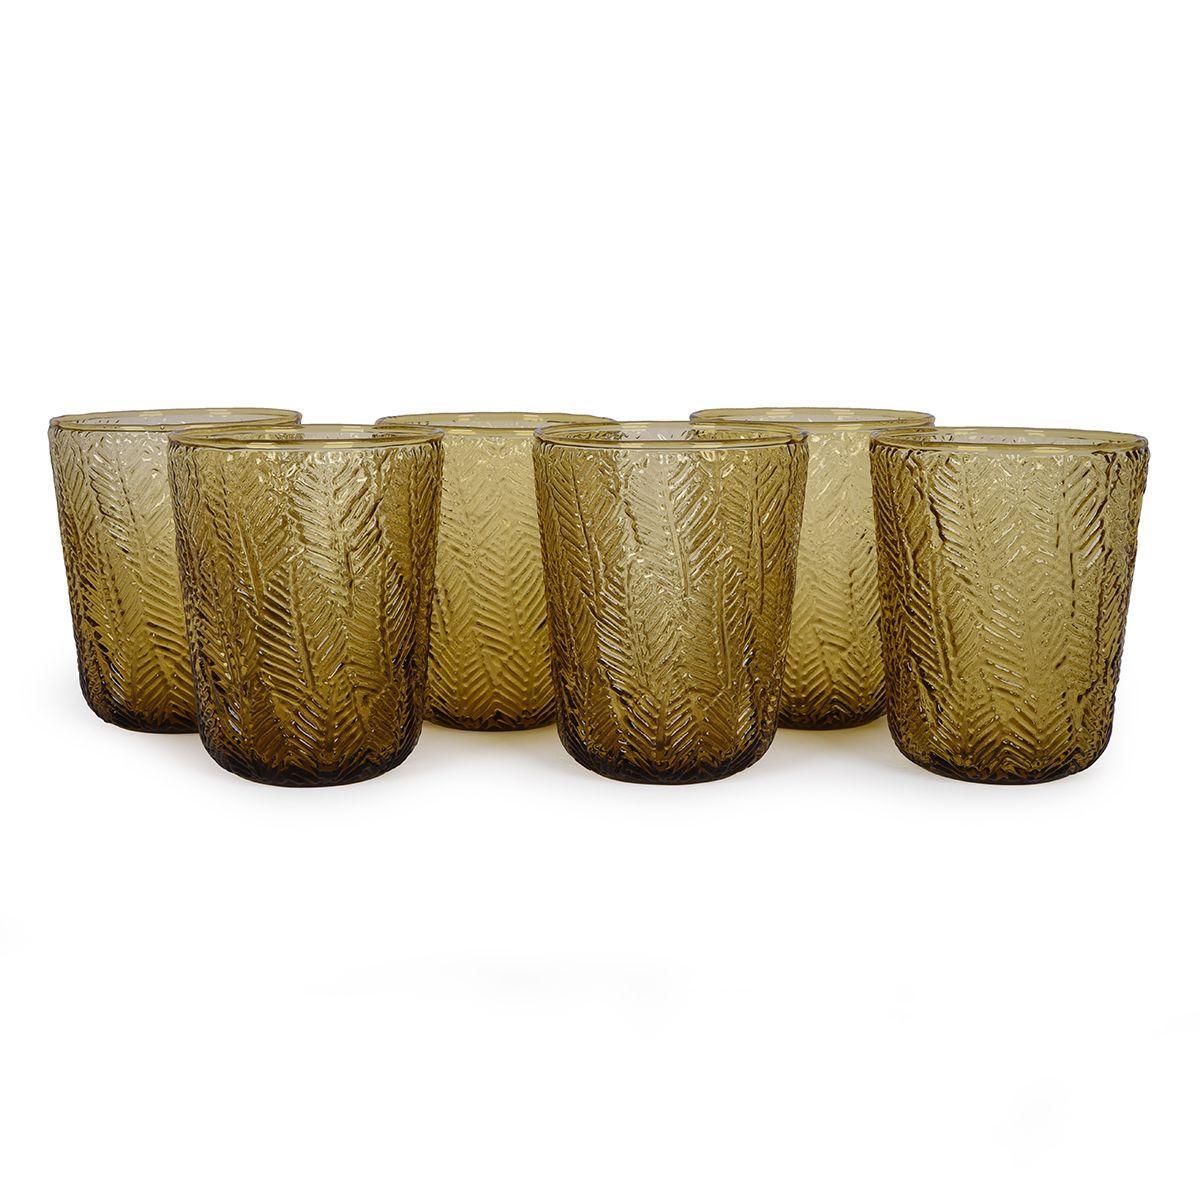 Стеклянные стаканы янтарного цвета, набор 6 шт. Montego